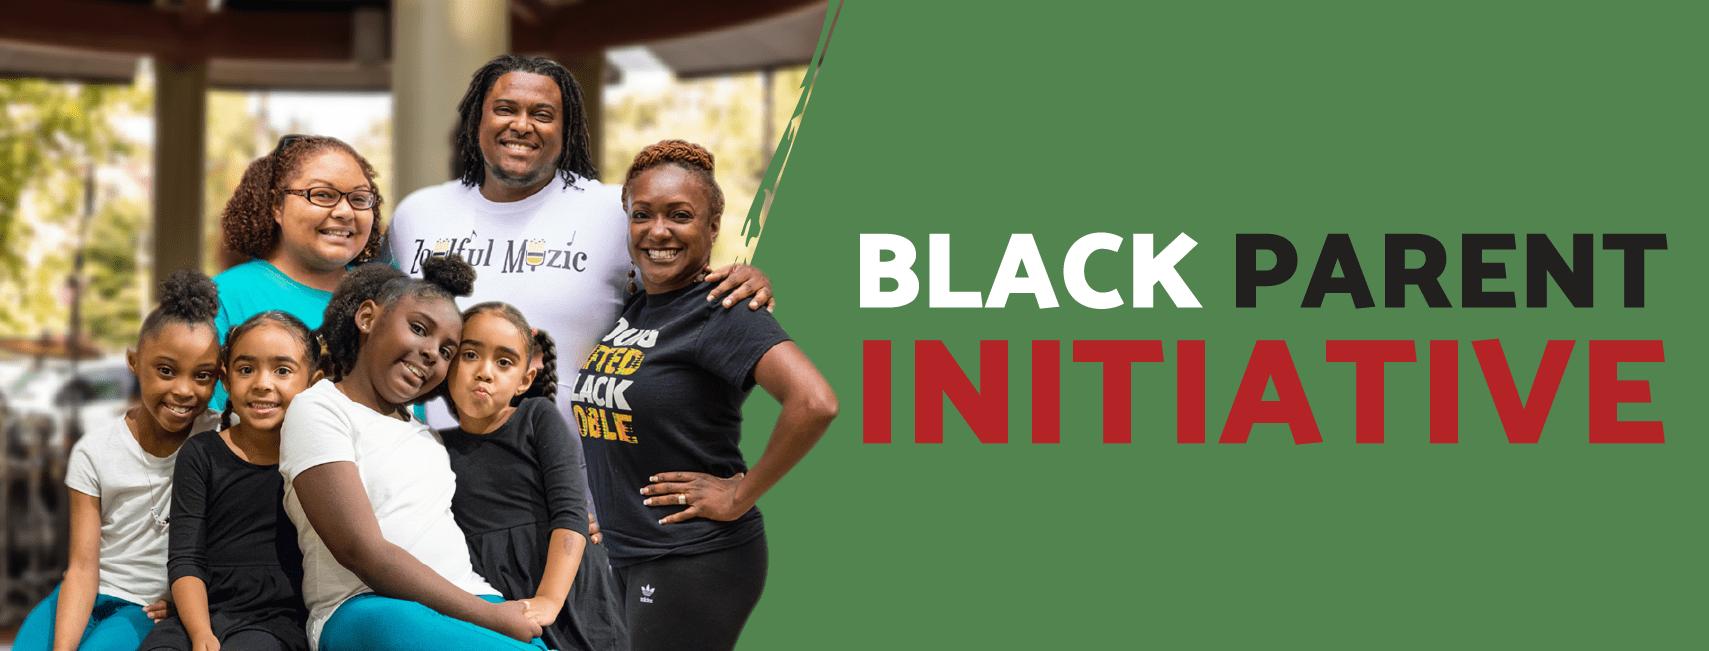 Black Parent Initiative (Black Community Support)